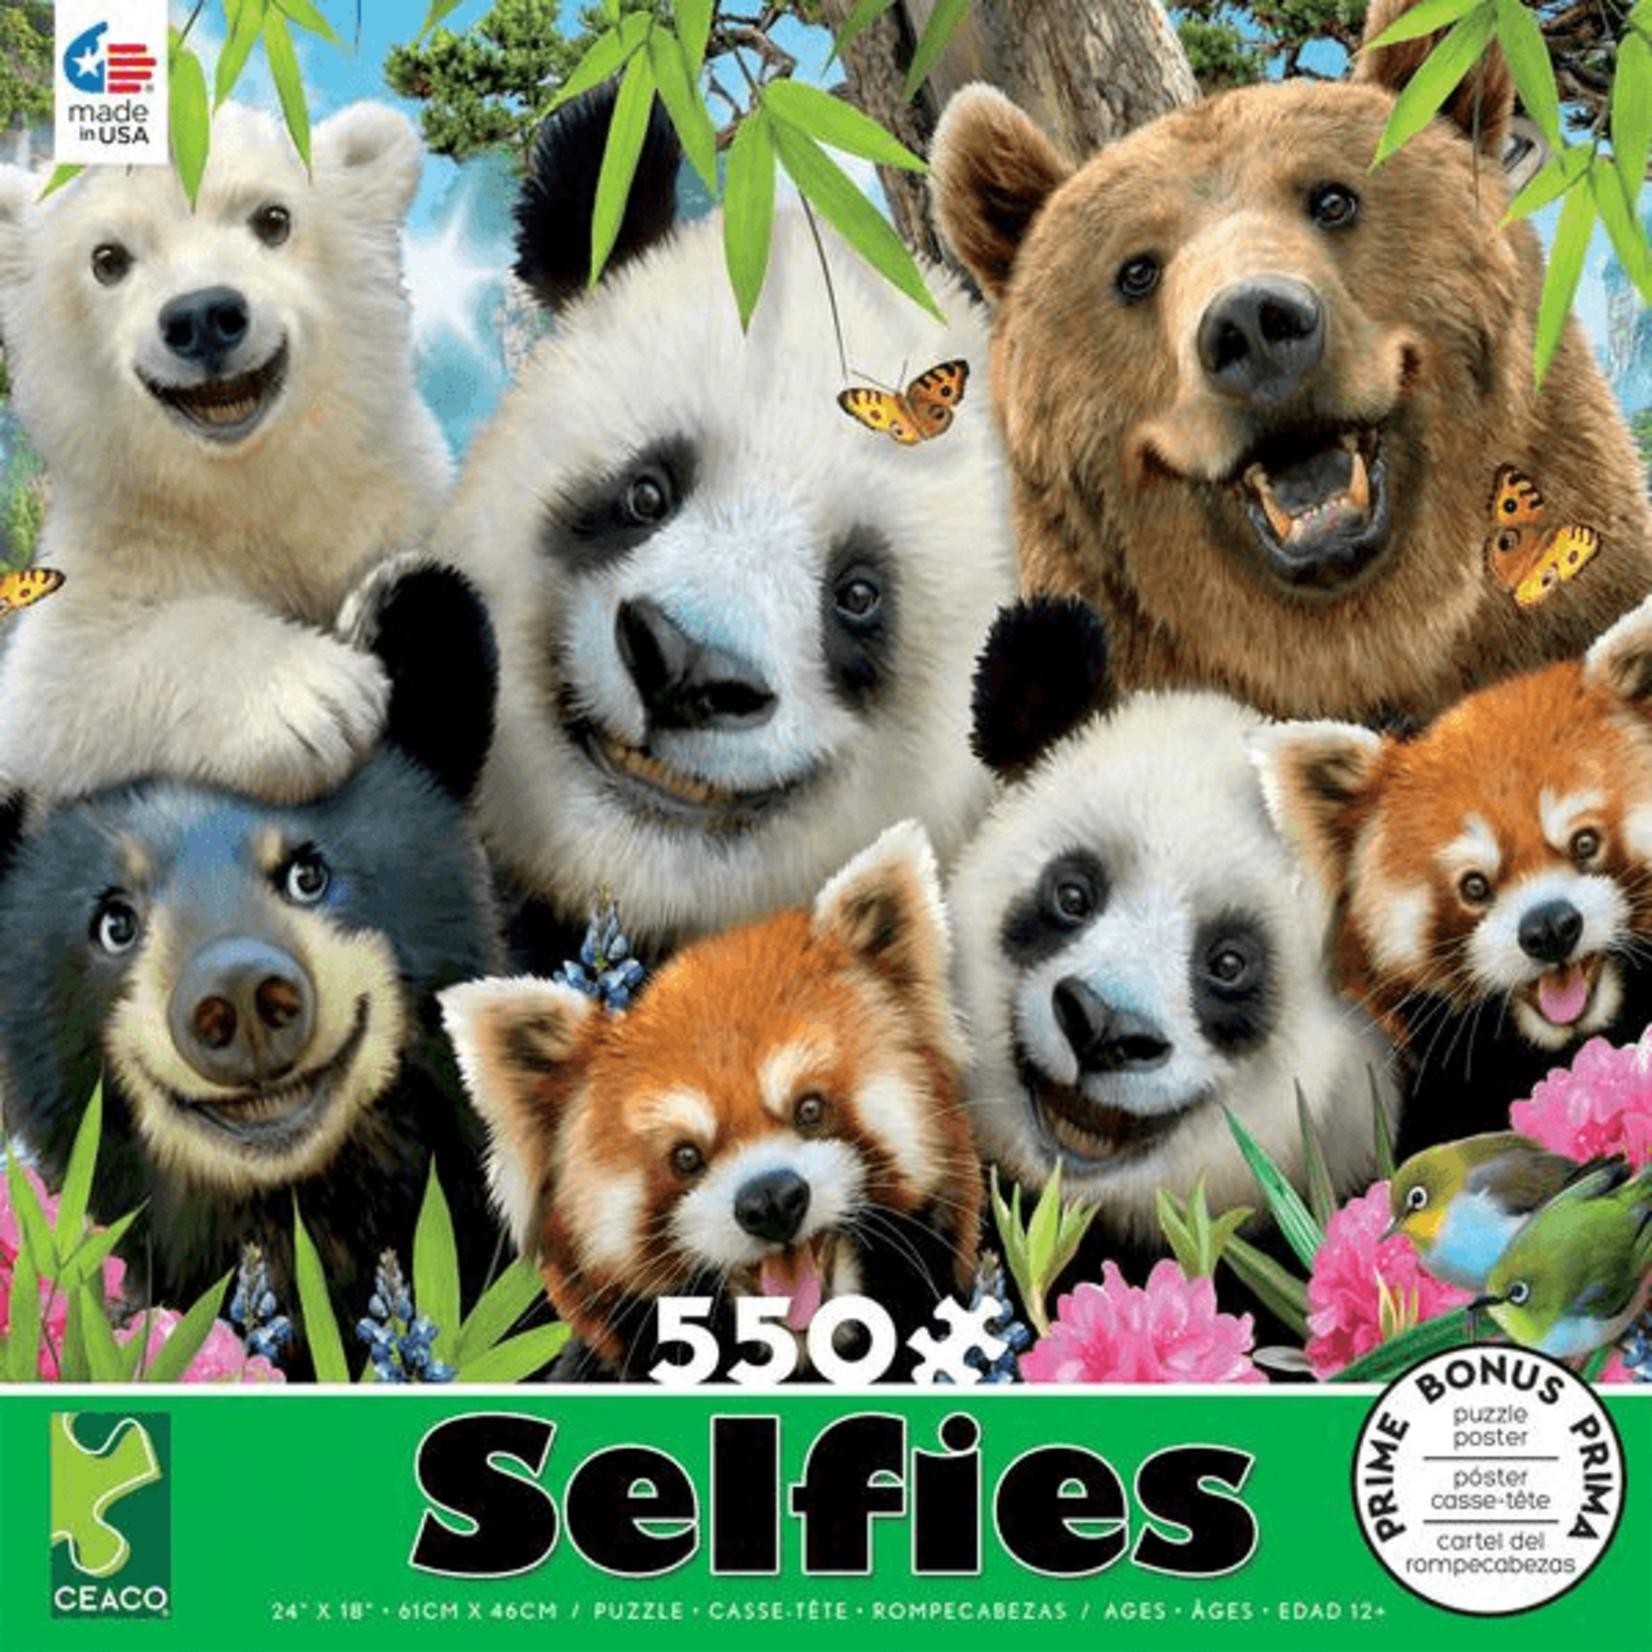 CEACO Bear Essentials Selfies 550pc